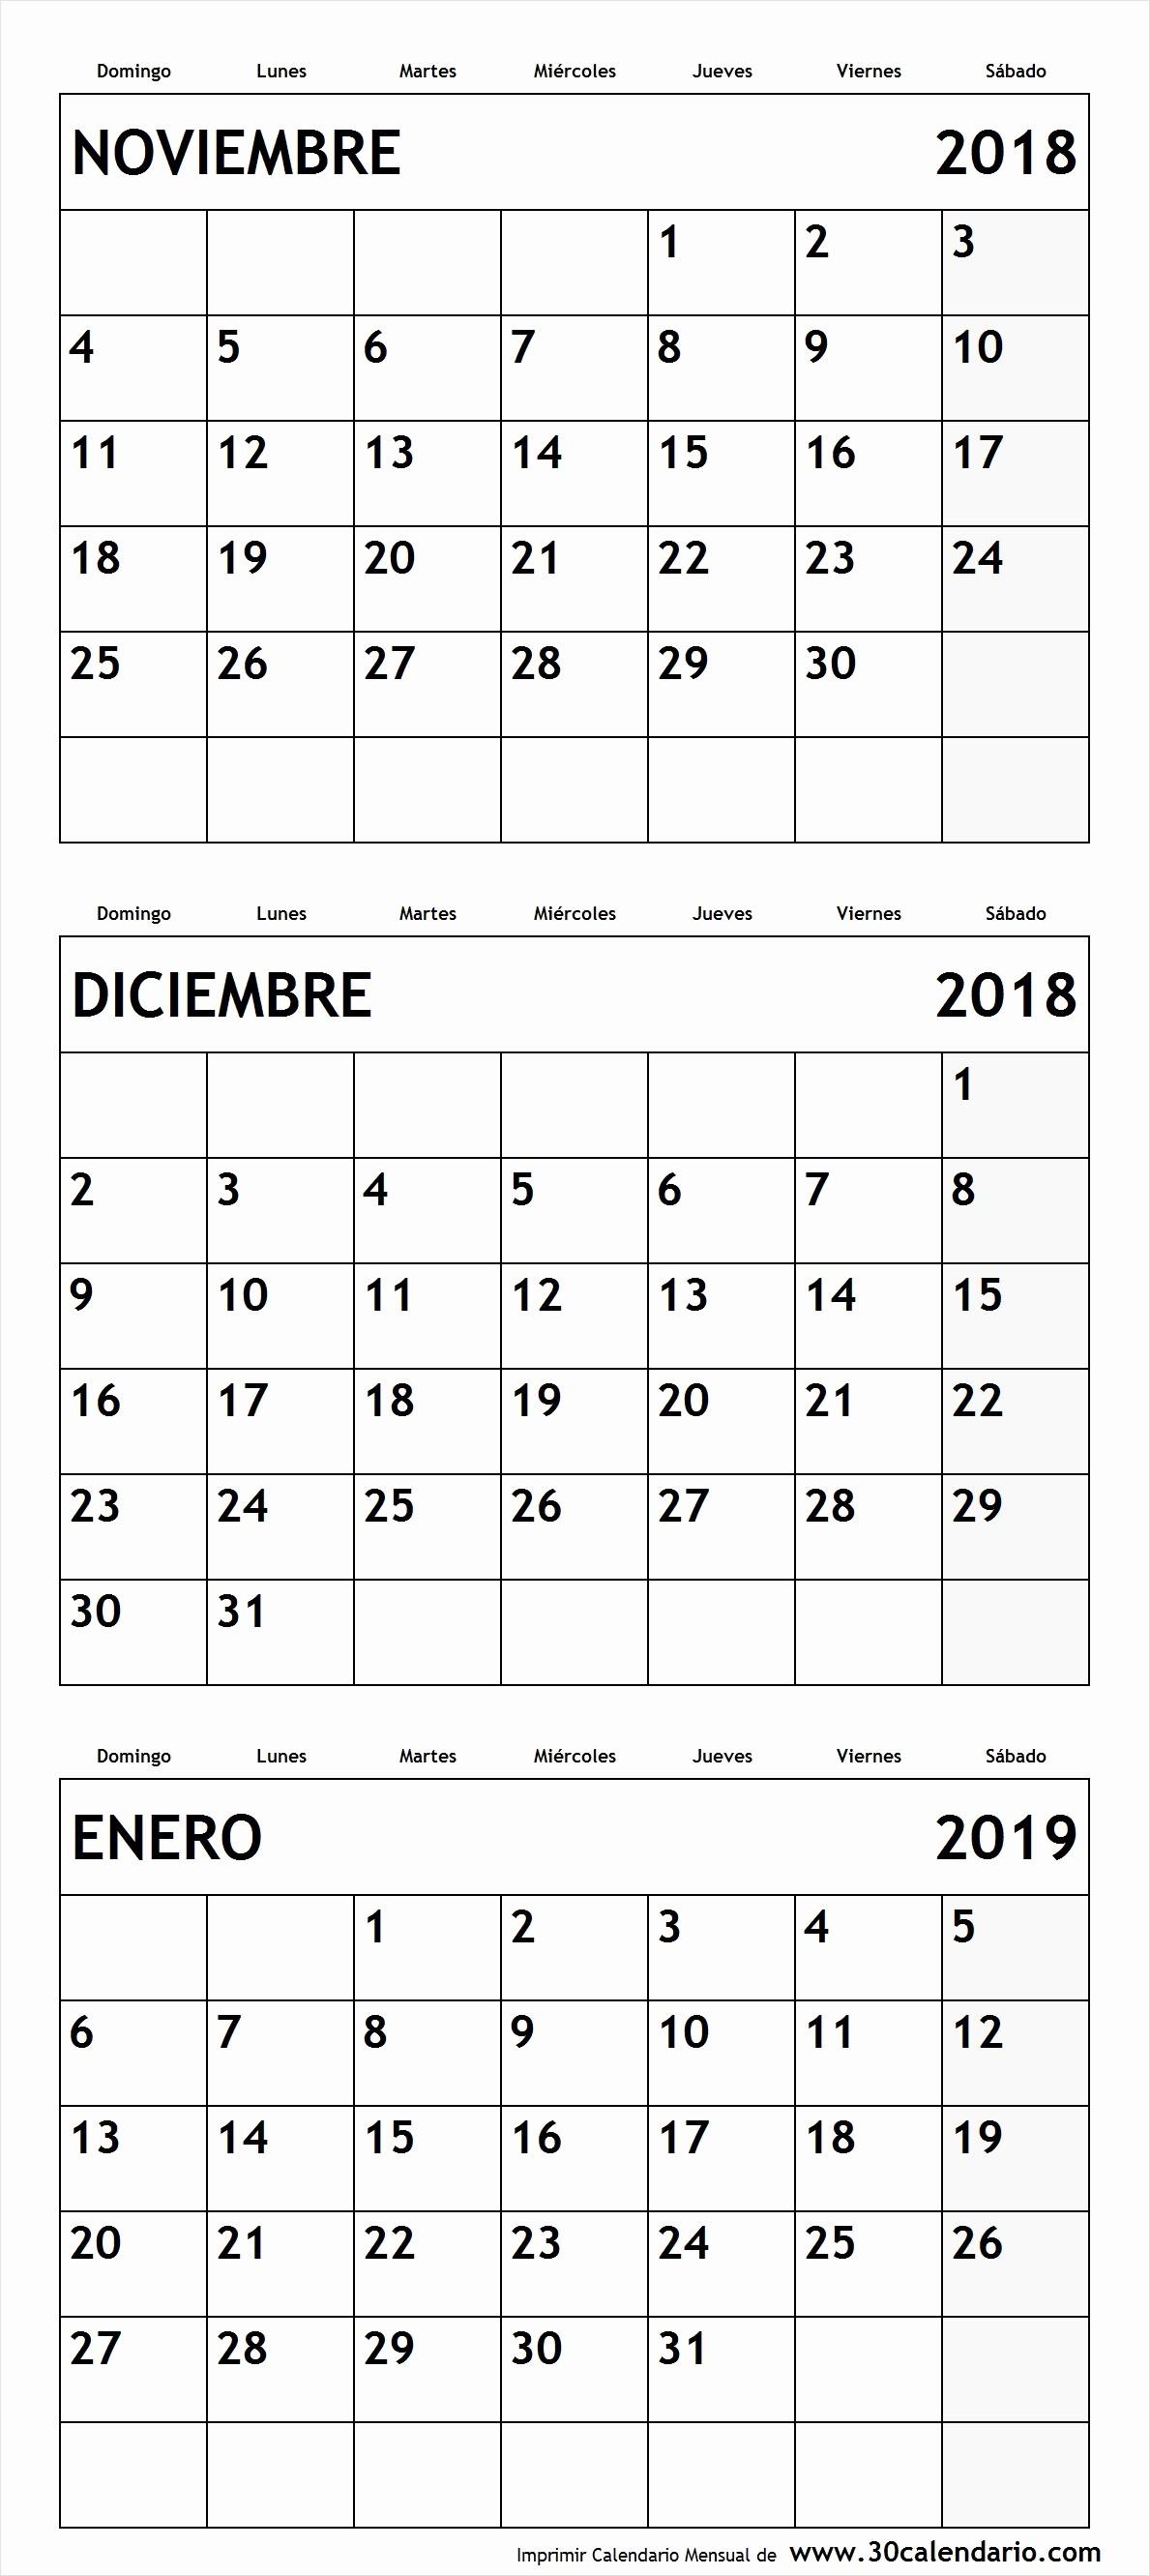 Calendario Febrero 2018 Para Imprimir Fresh Calendario 2019 Colombia Para Imprimir Febrero Car